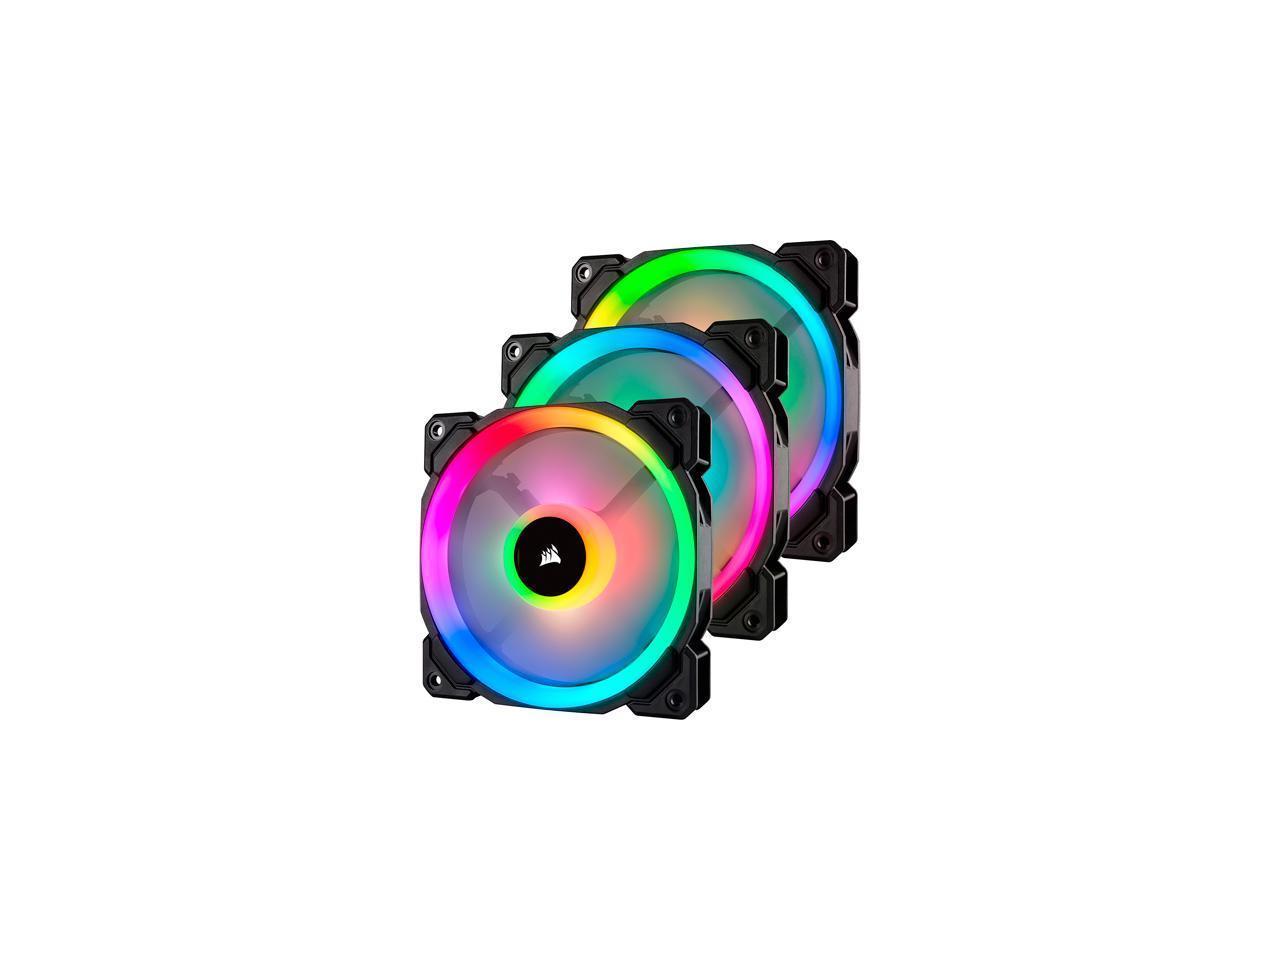 Fan Corsair LL120 RGB Triple Pack + Lighting - CO-9050072-WW